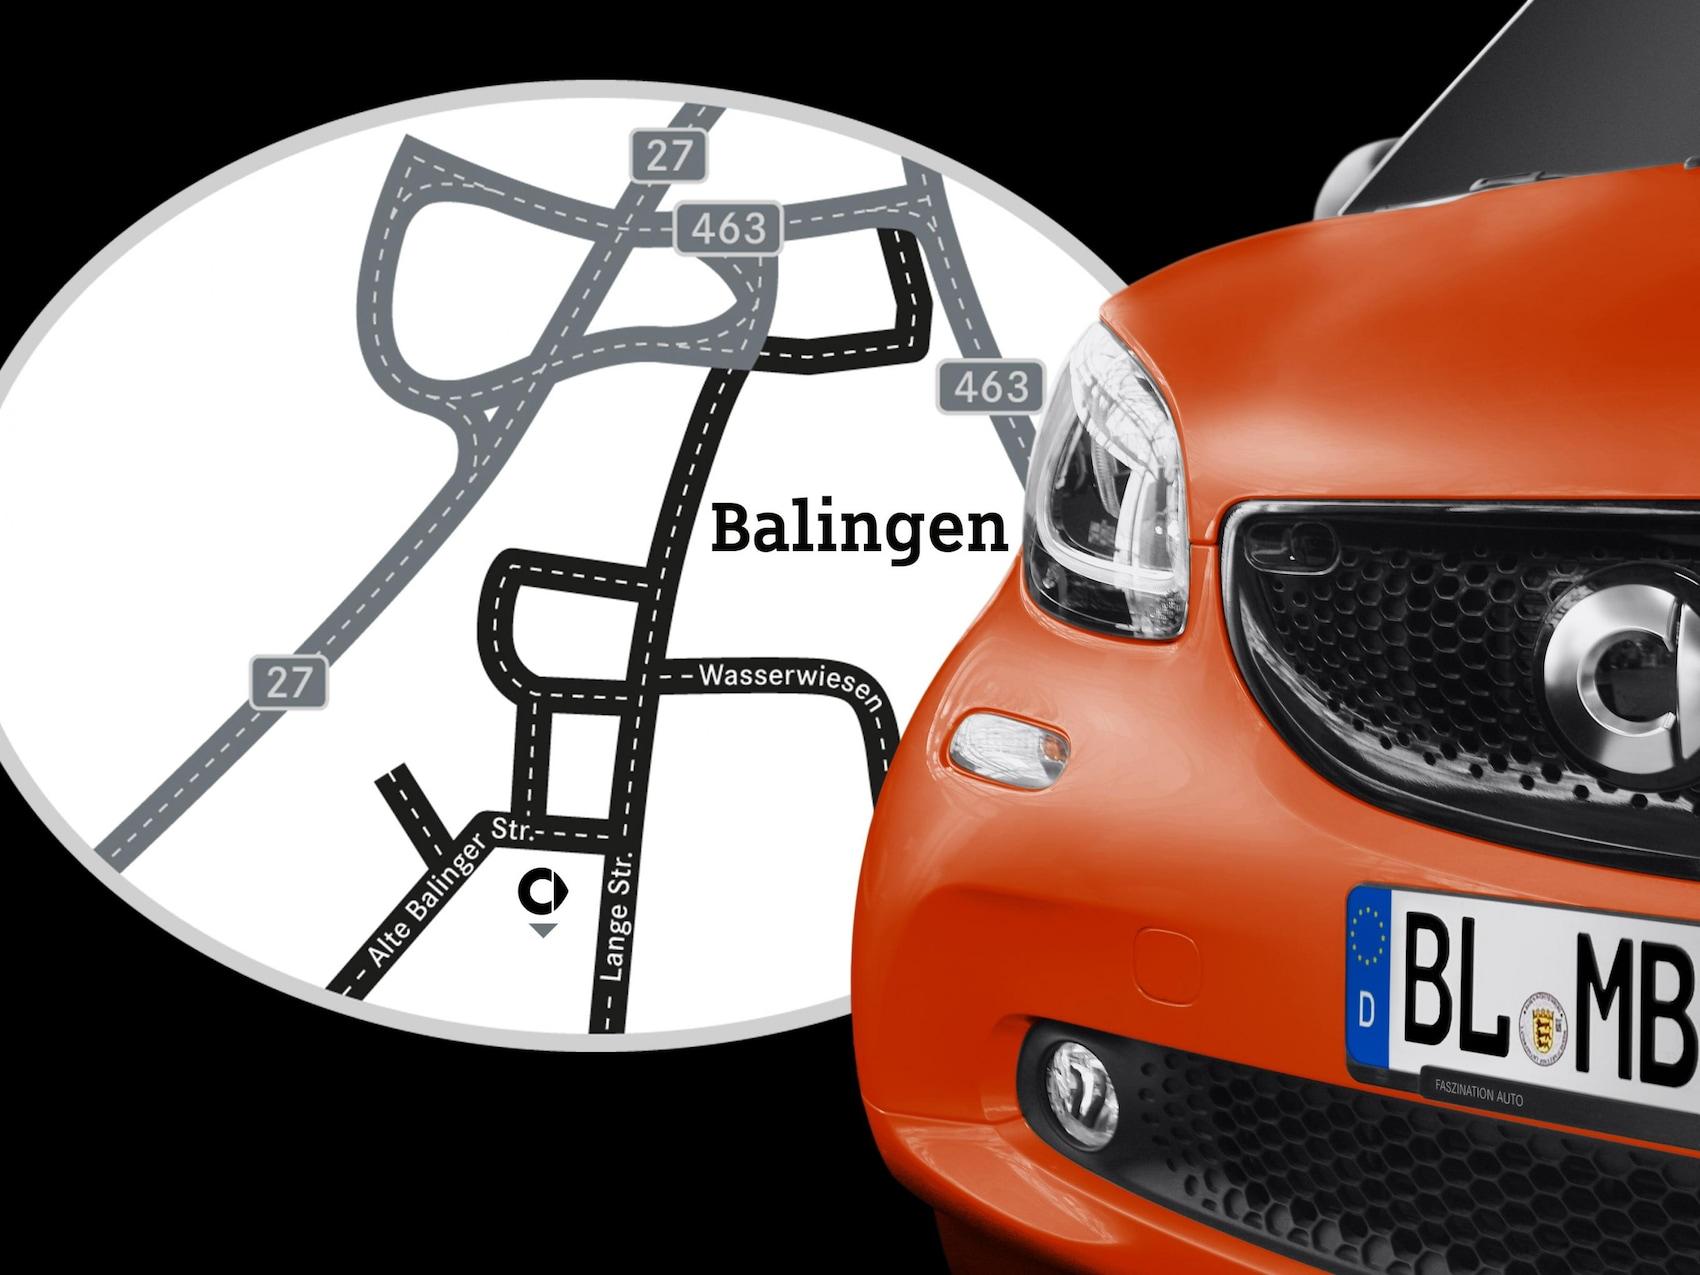 Riess Standort Balingen